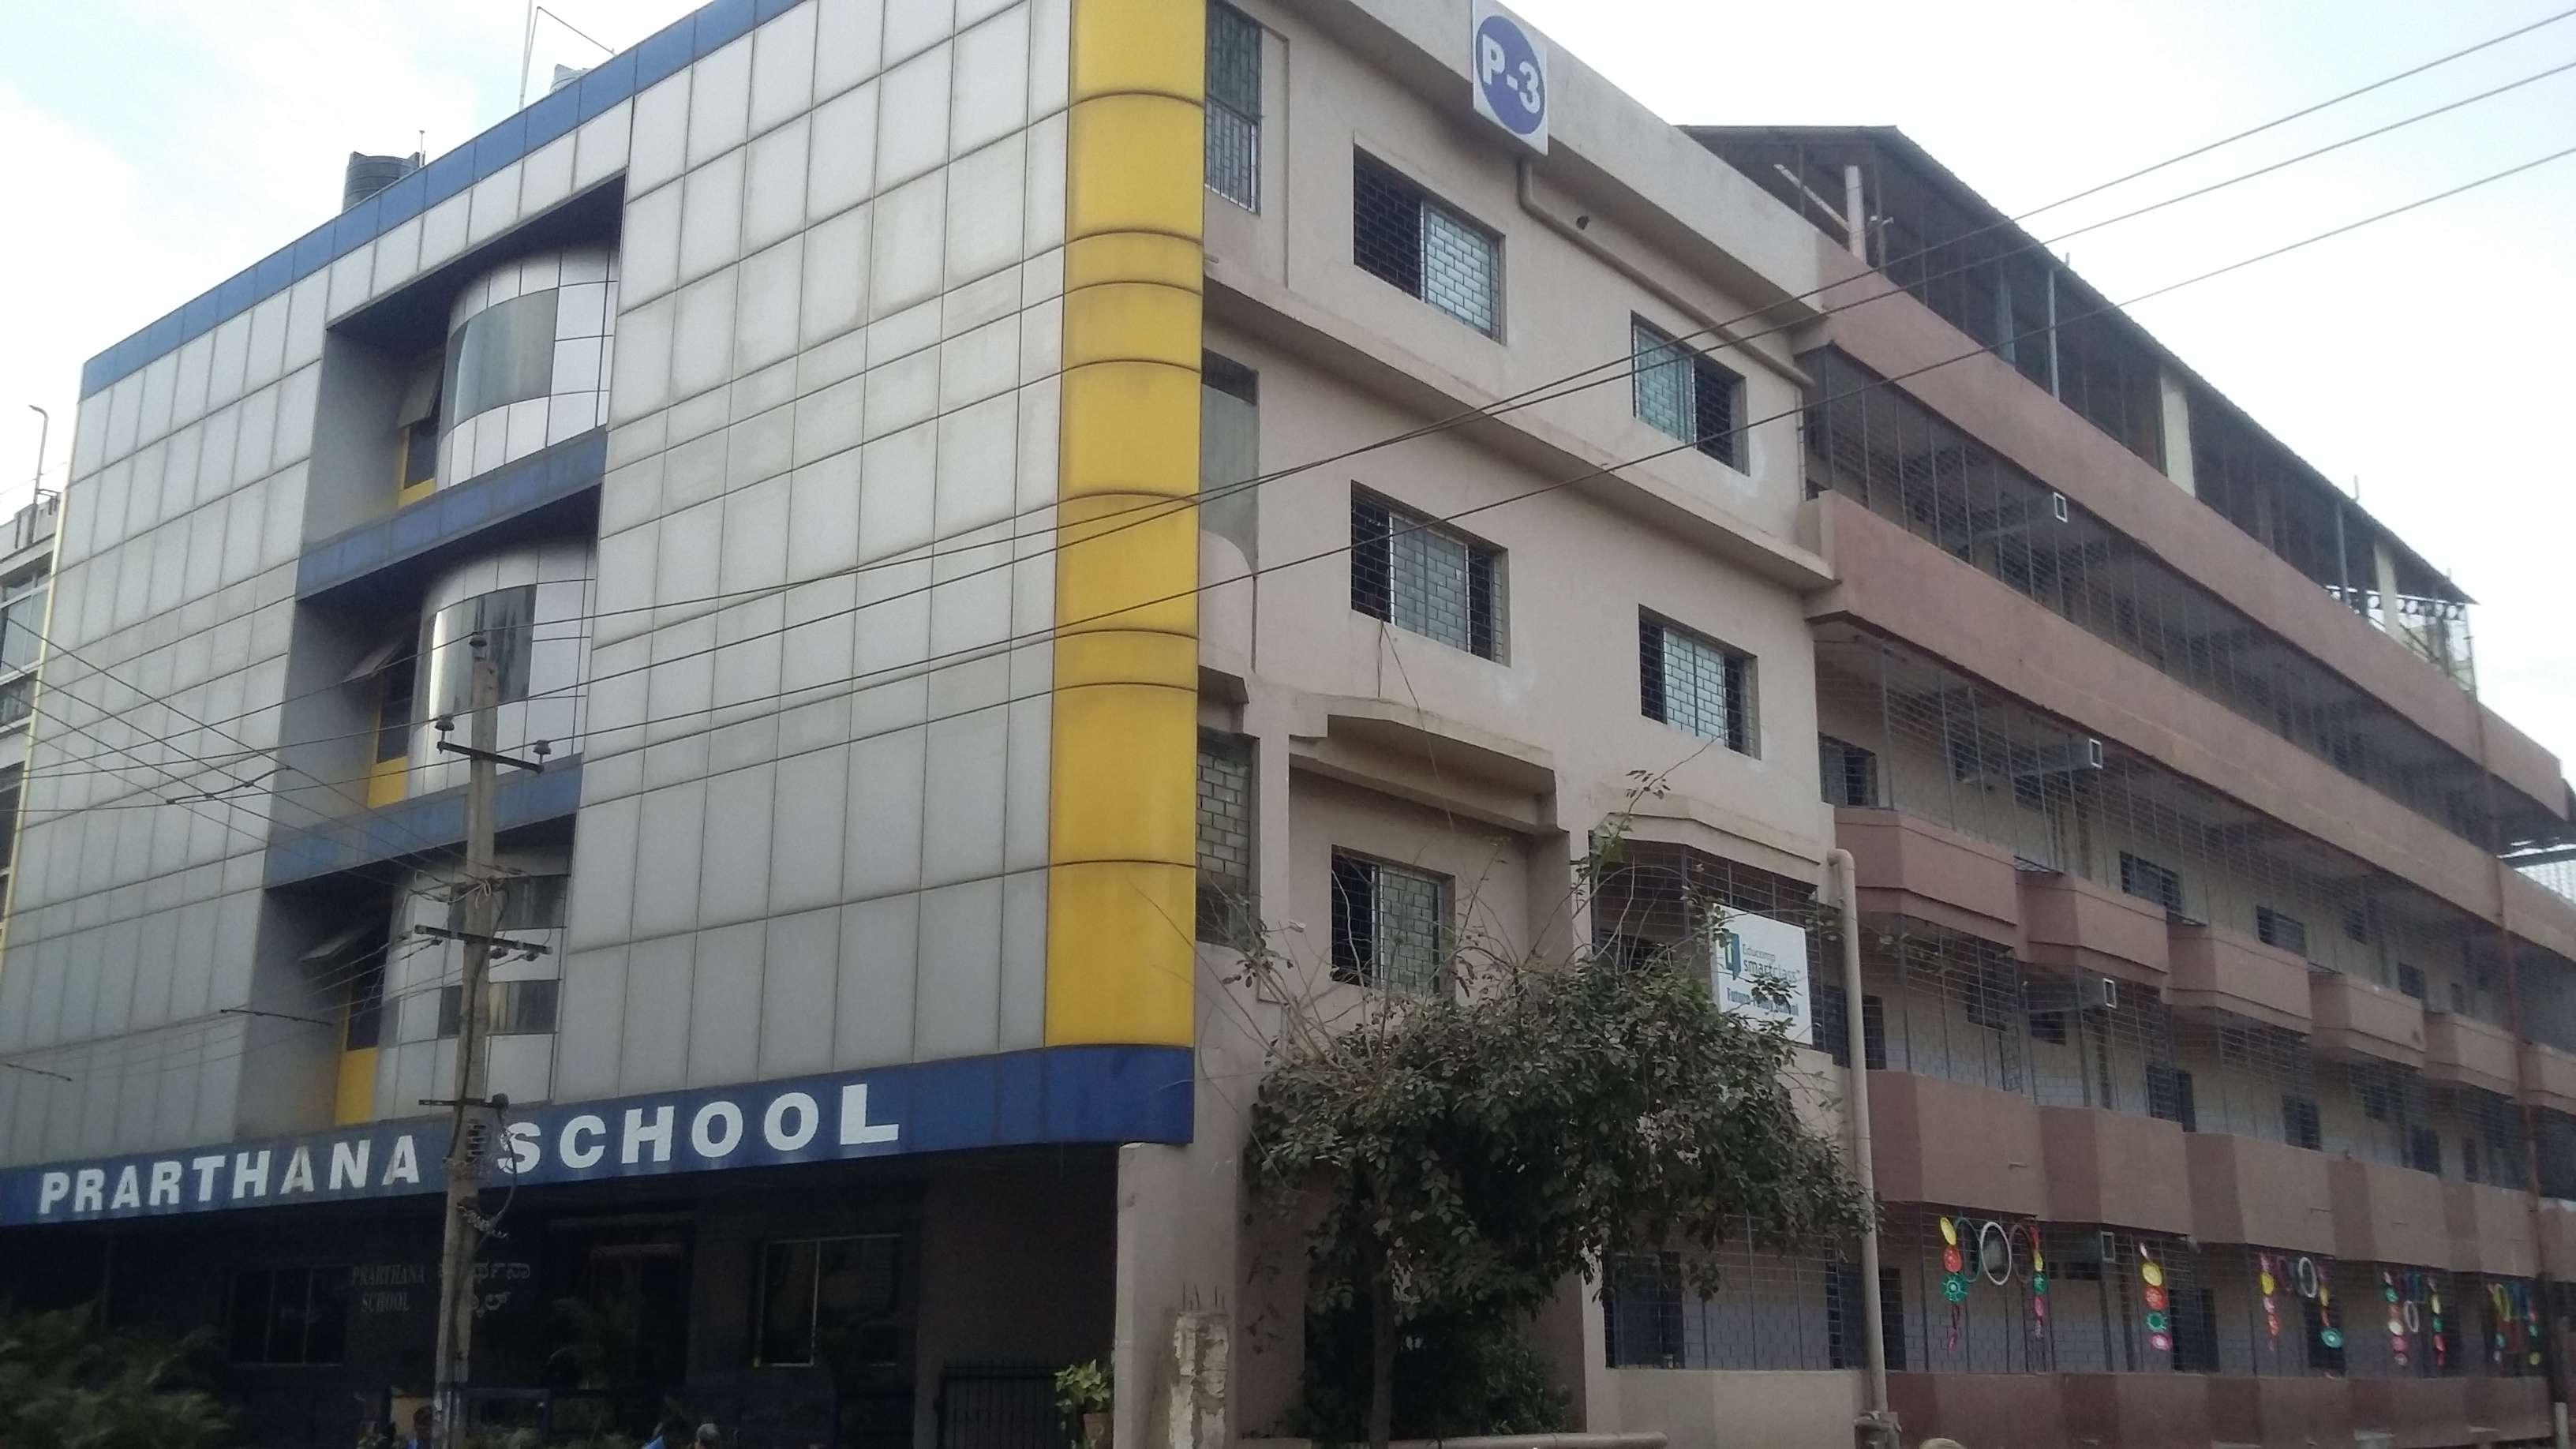 PRARTHANA CENTRAL SCHOOL No 30 Subramanya Pura Main Road Chikkalasandra Bangalore 560 070 830340